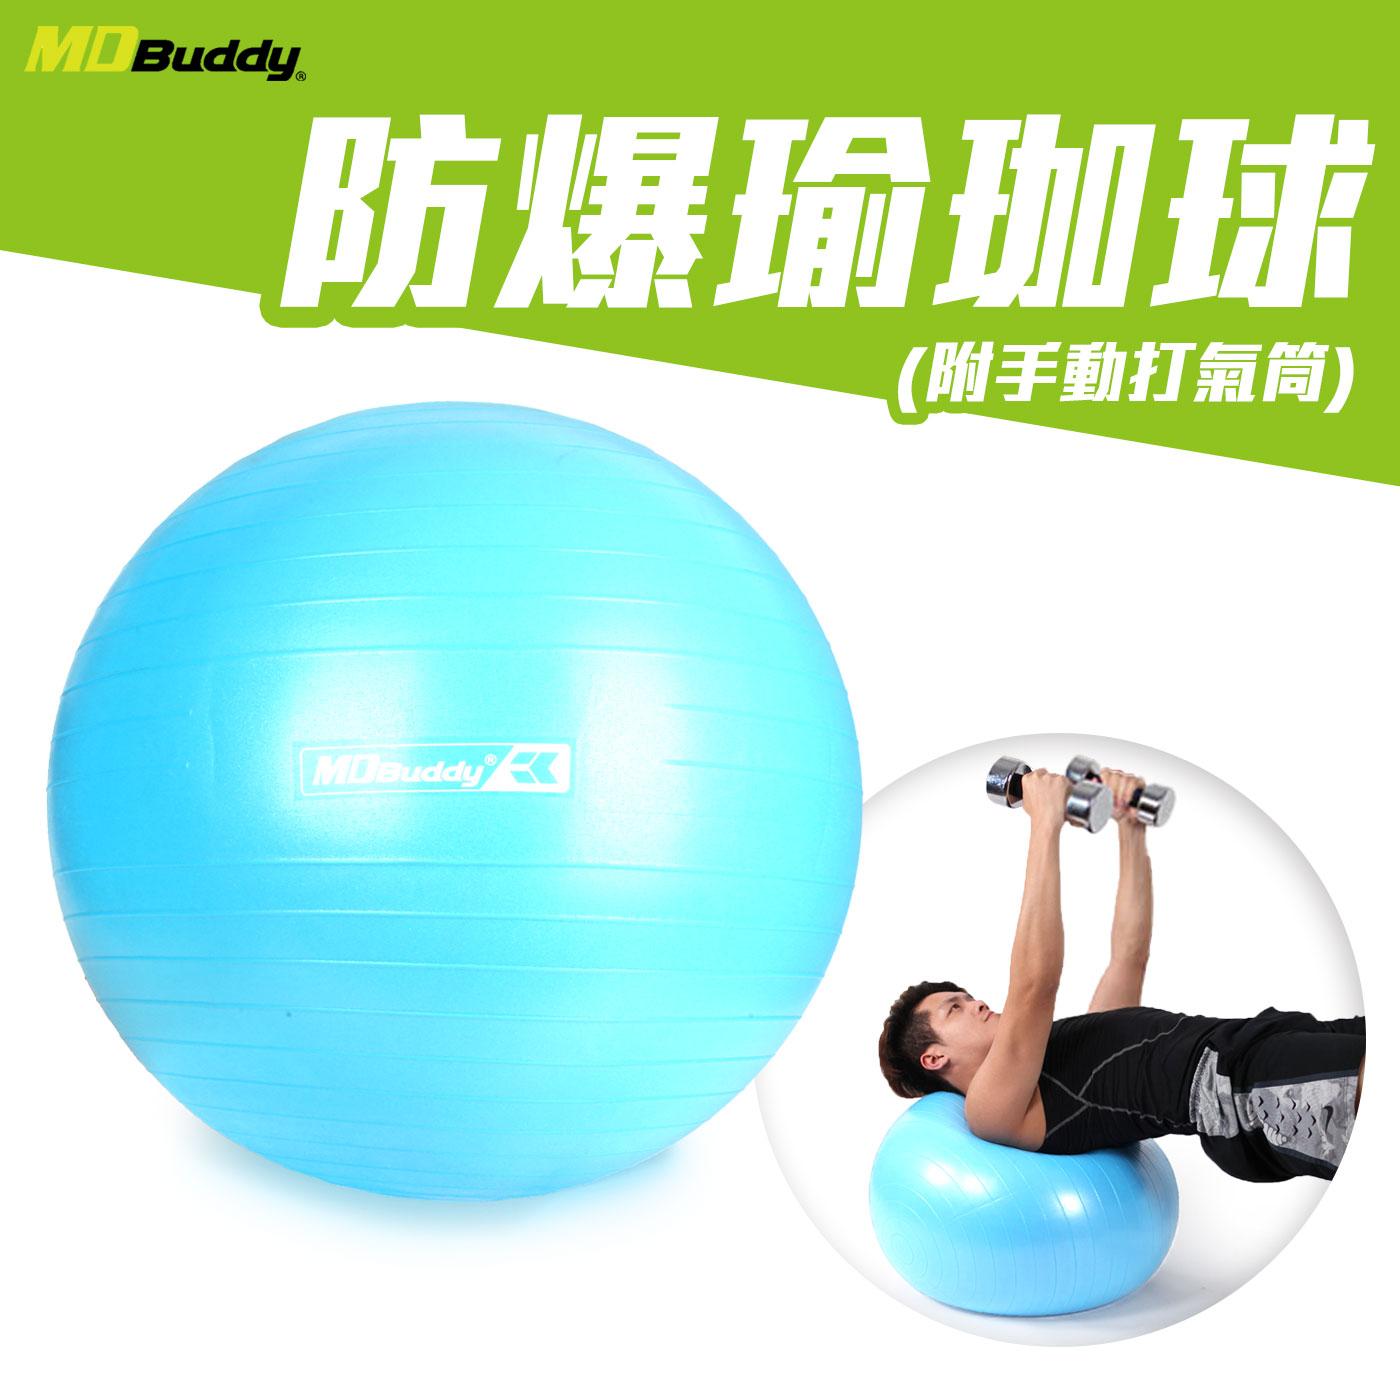 MDBuddy 防爆瑜珈球(附手動打氣筒) 6022801 - 隨機